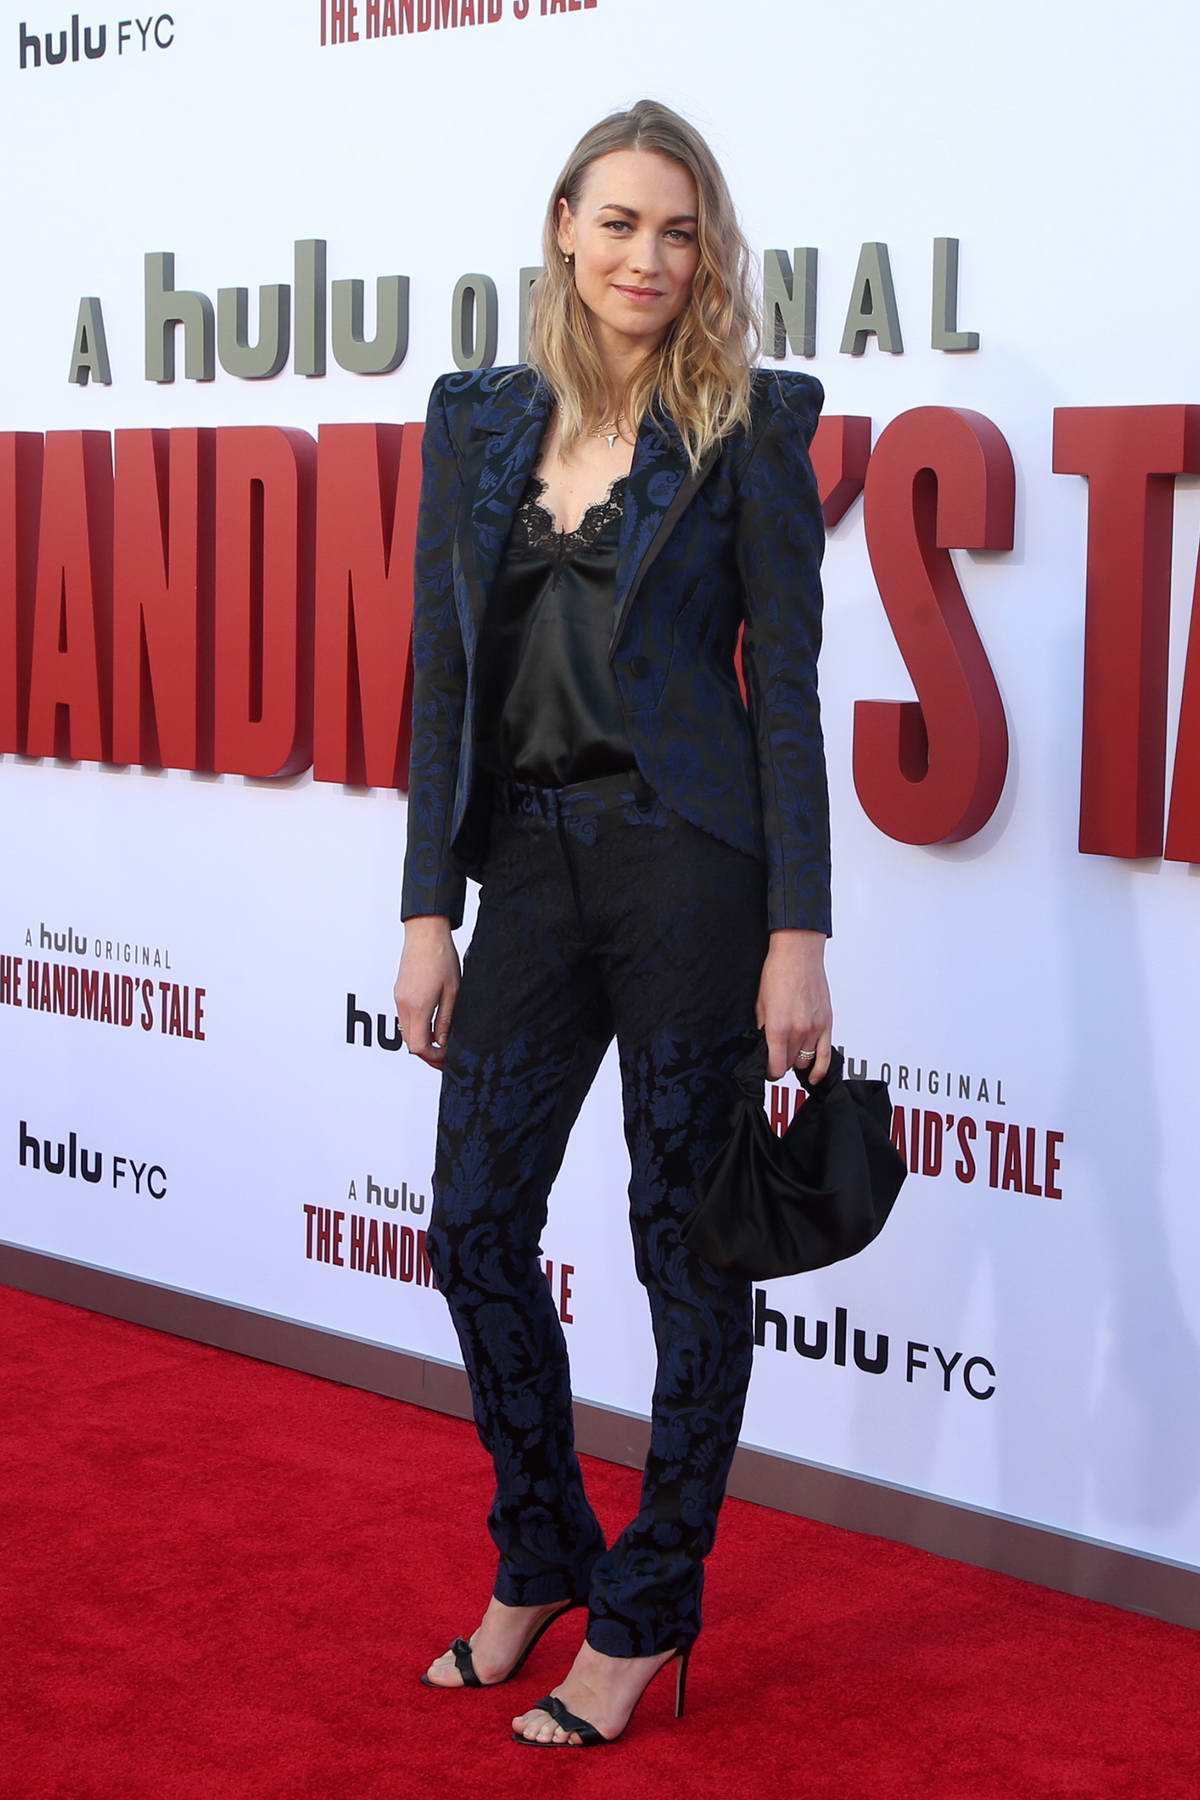 Yvonne Strahovski attends 'The Handmaid's Tale' Season 3 Finale at Regency Village Theatre in Westwood, California